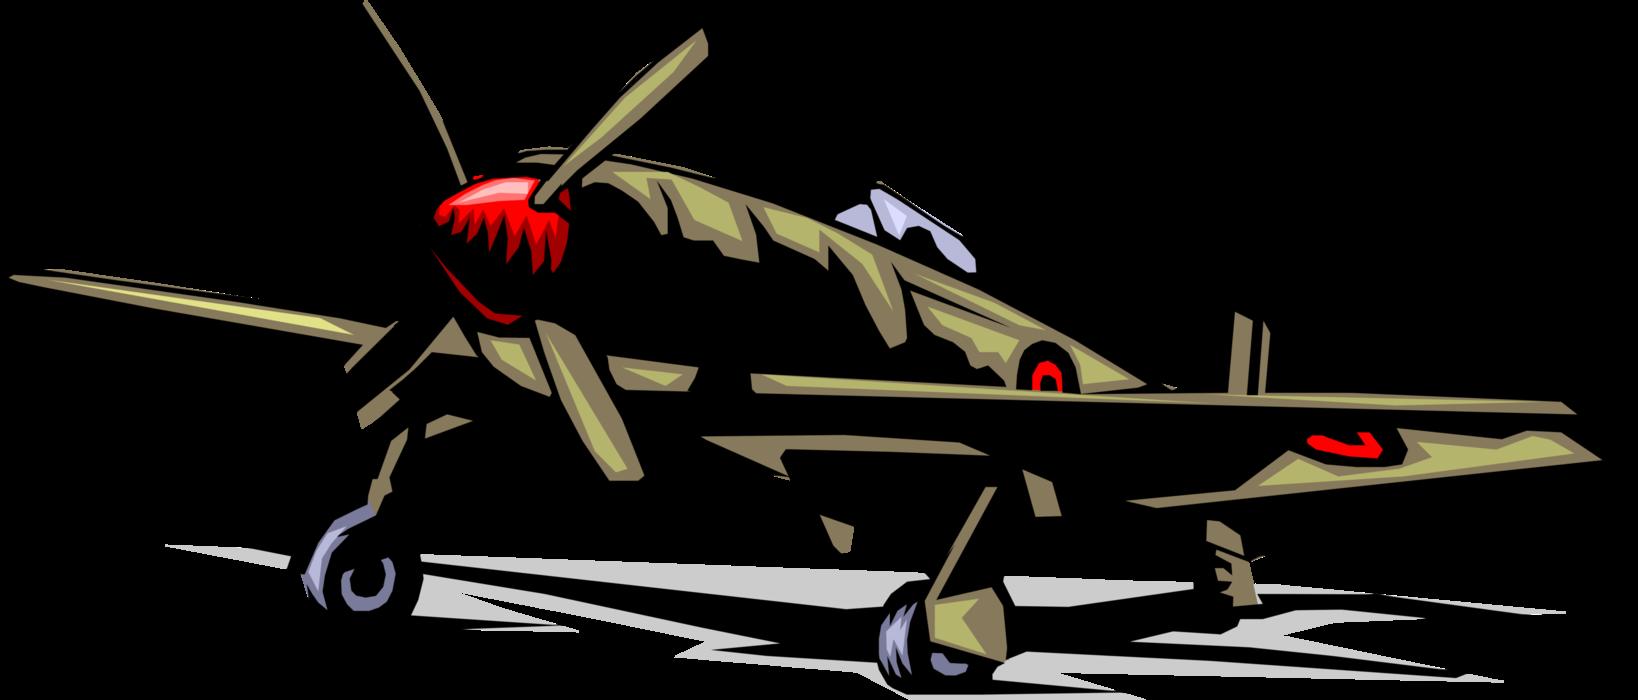 jpg free download Spitfire British Royal Air Force Fighter